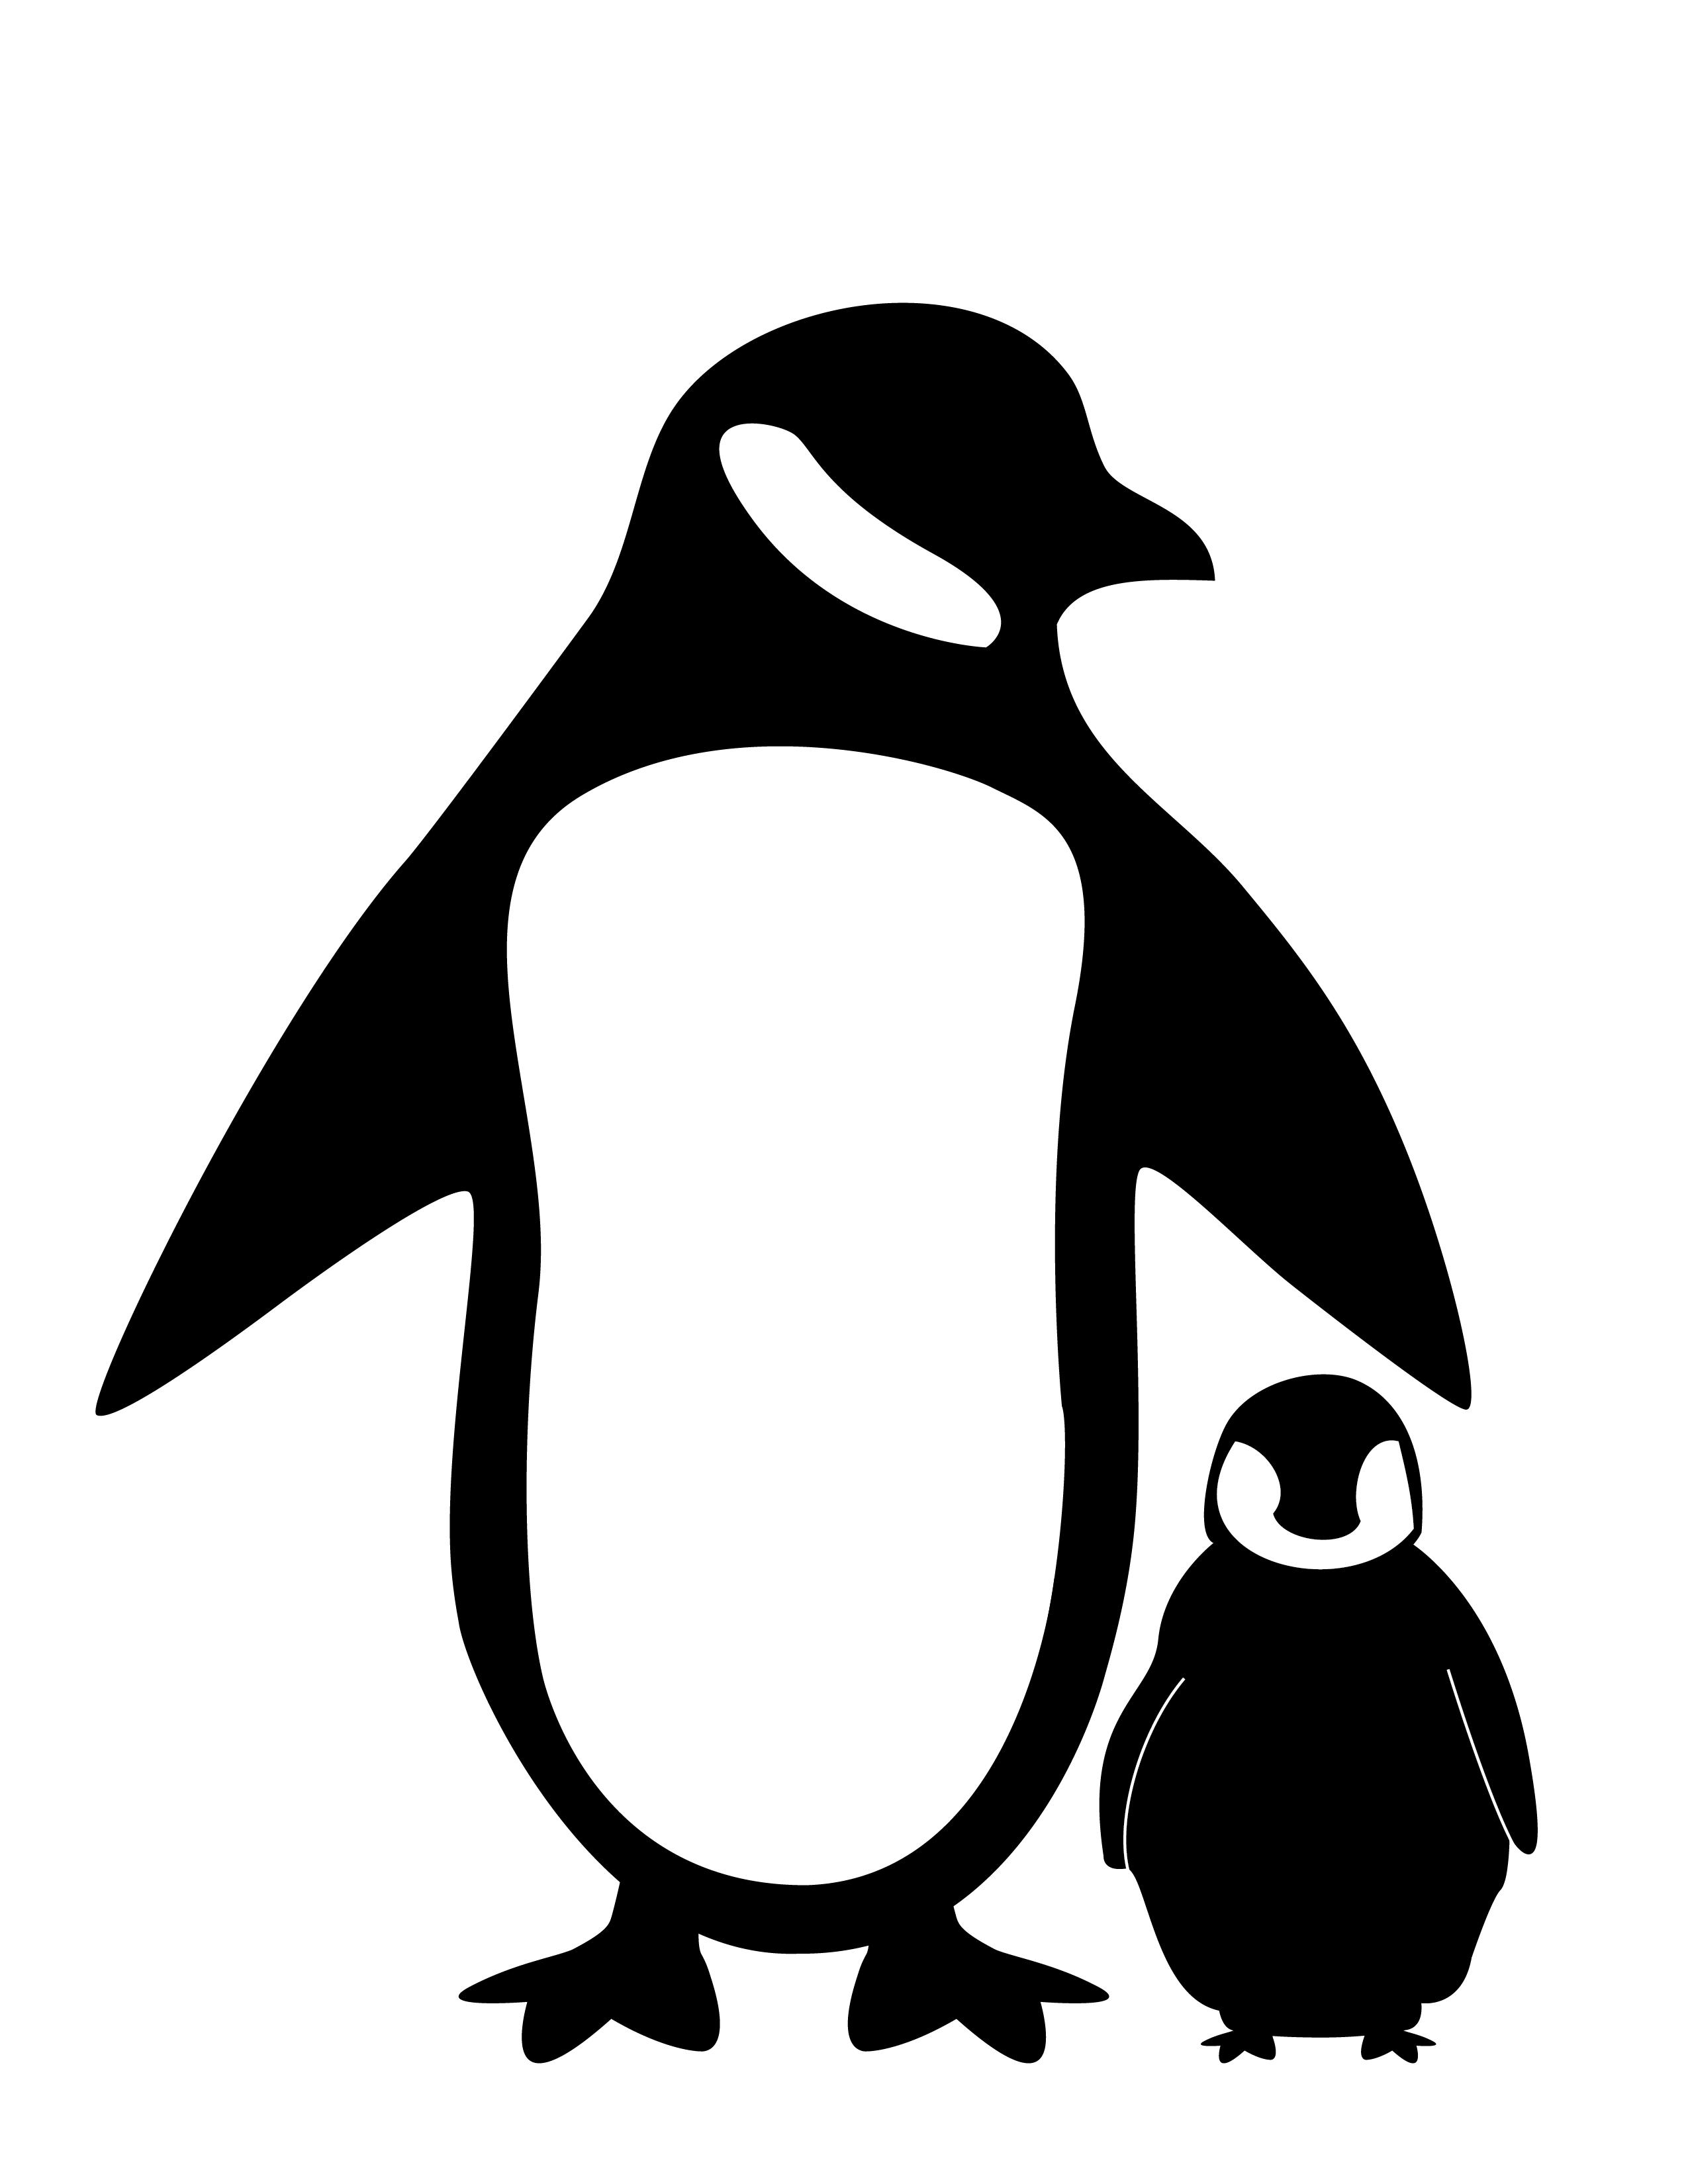 Clipart penquin silhouette. Penguin fc deviantart net